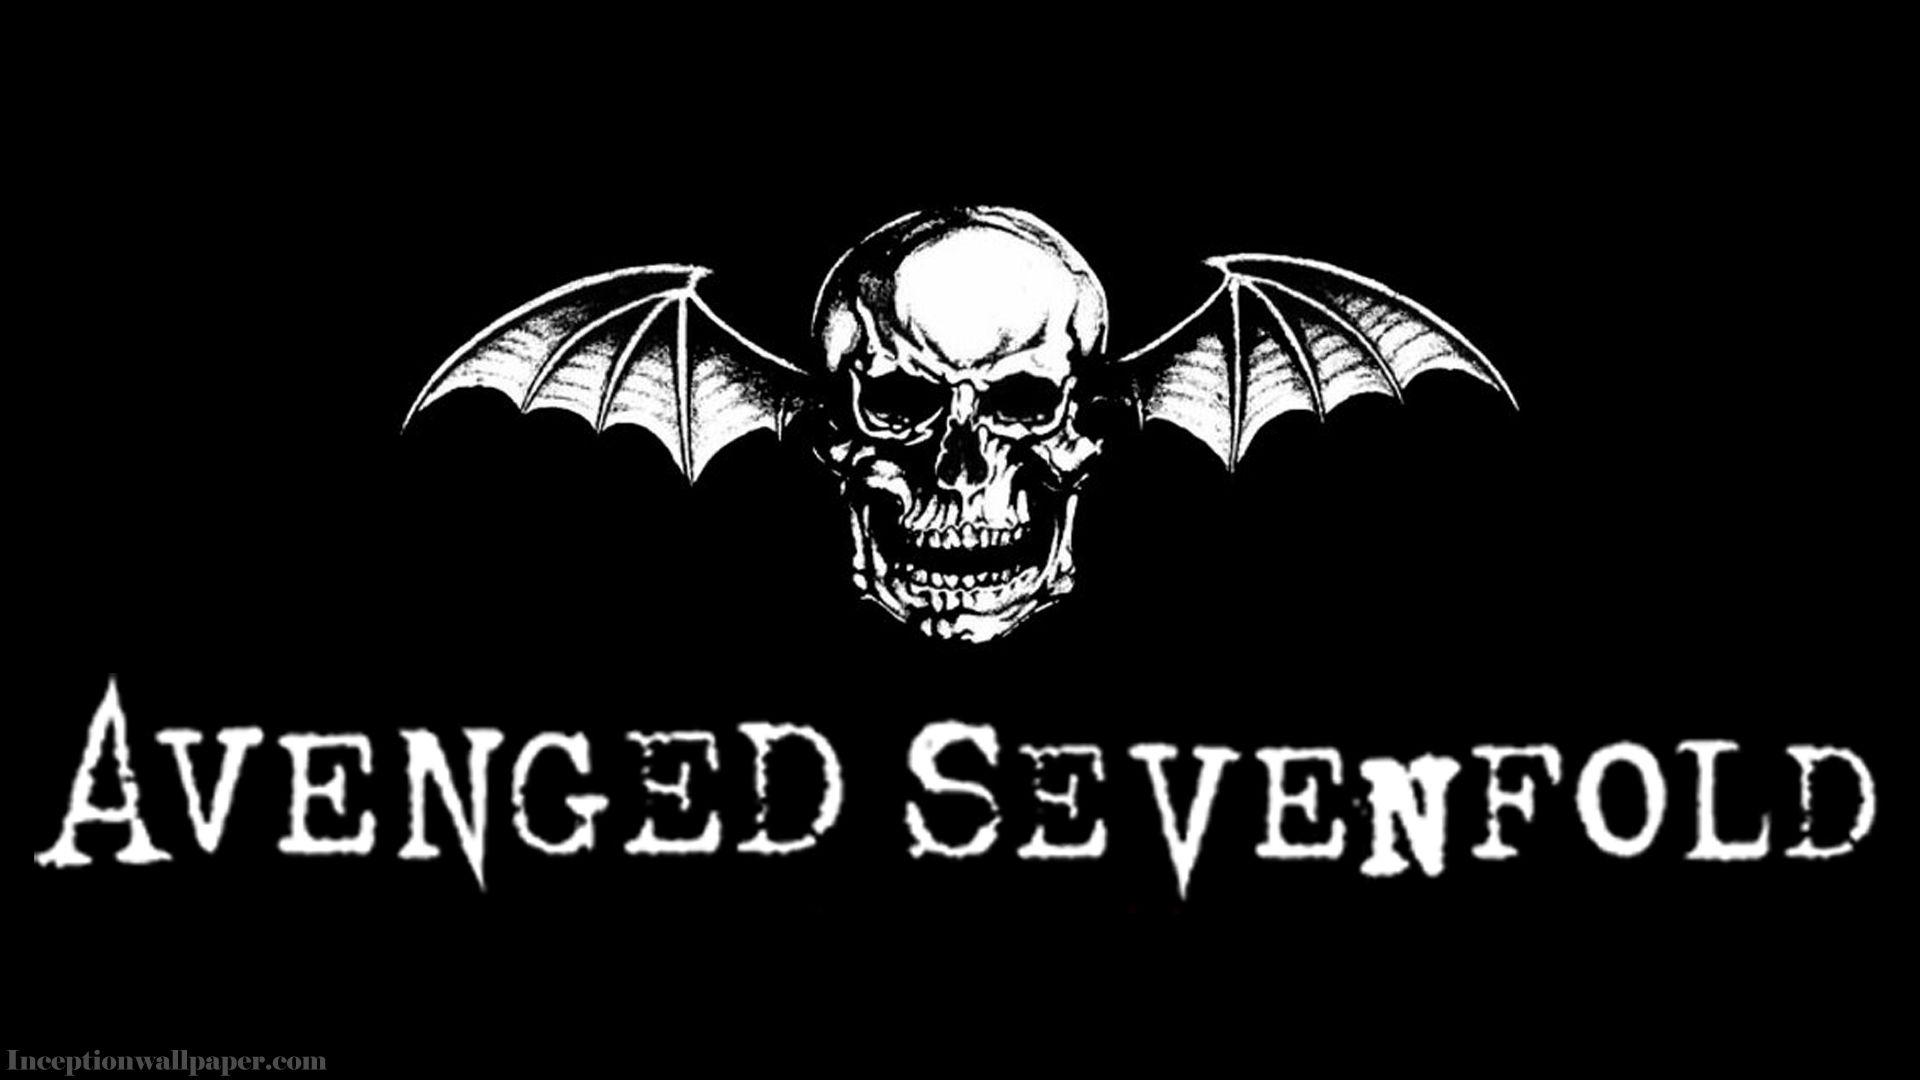 Avenged Sevenfold 1920x1080